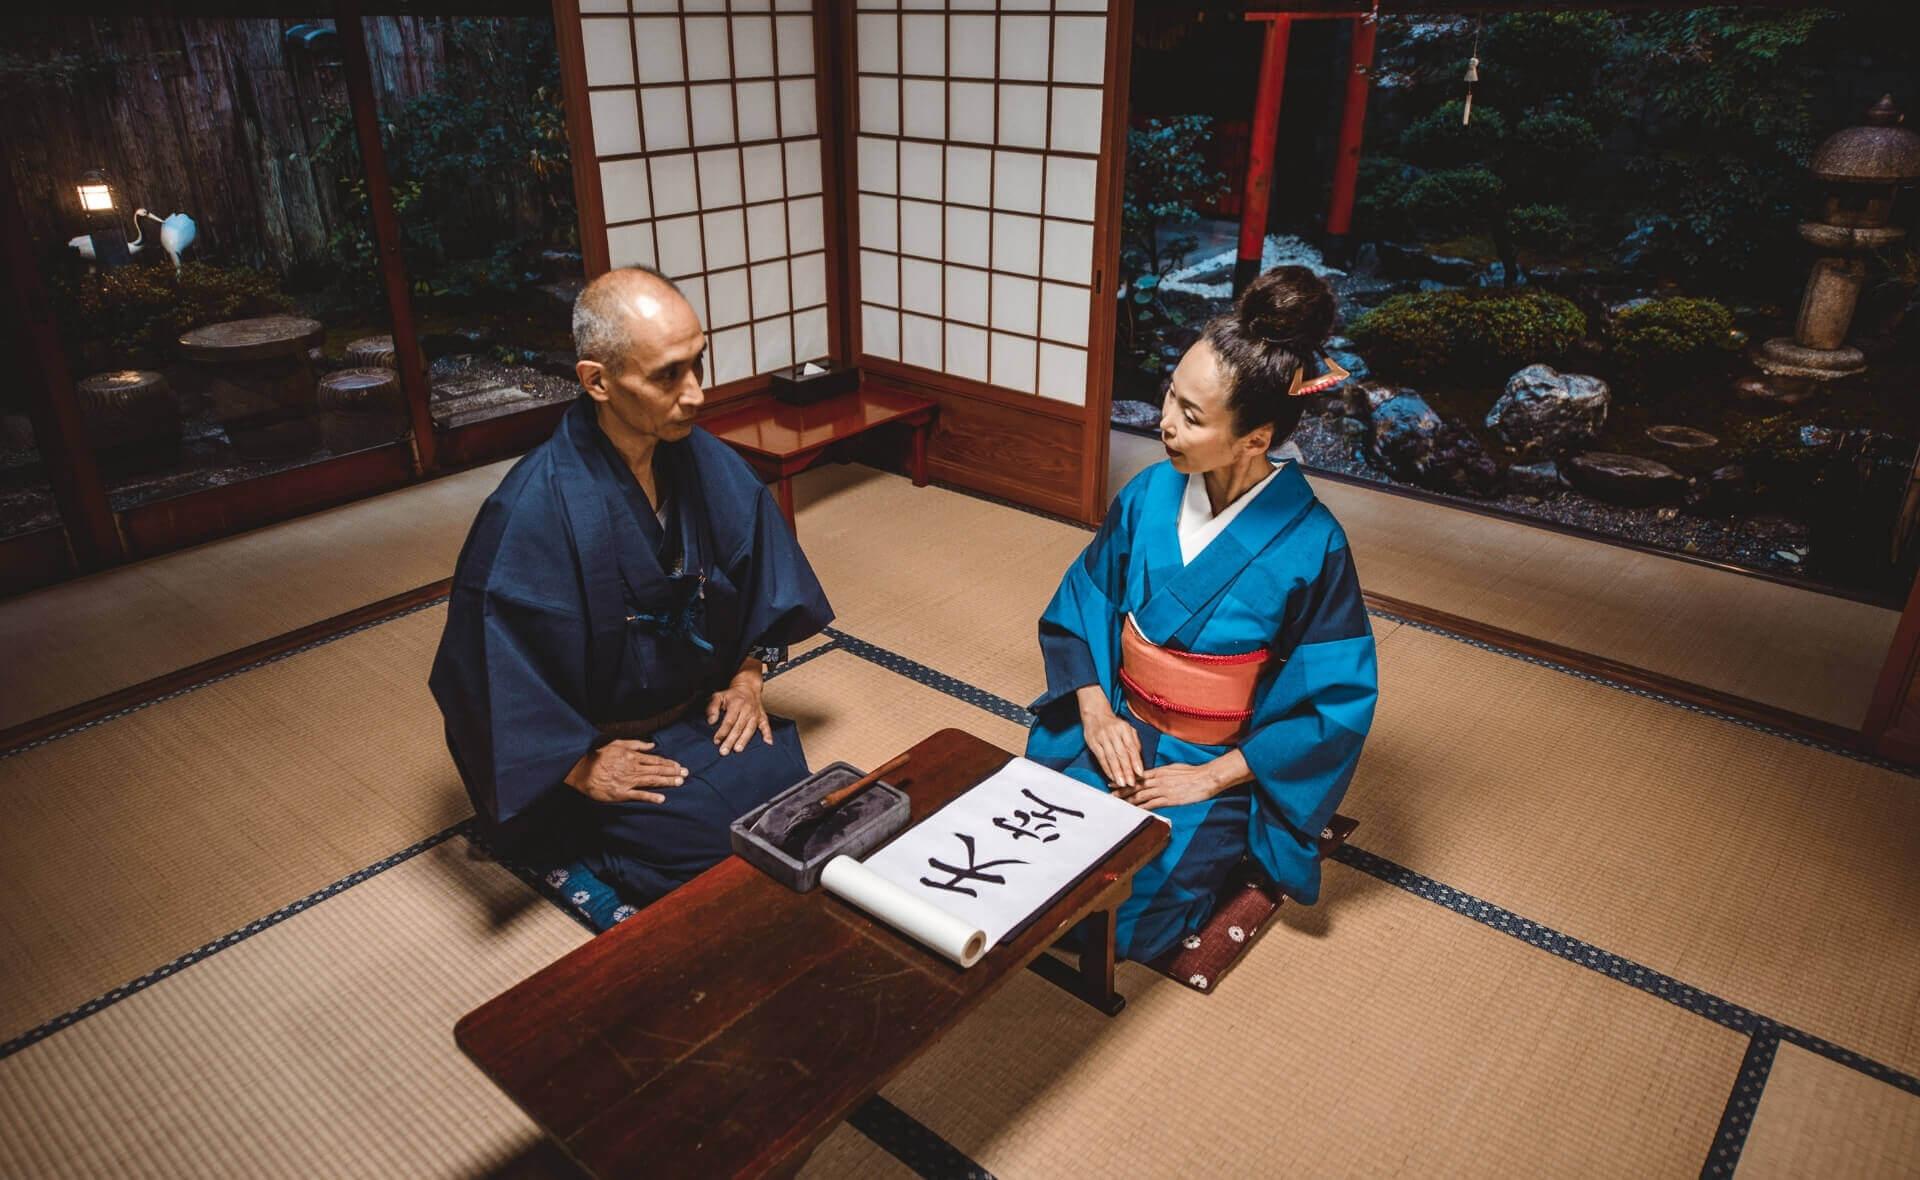 Семья японцев за занятием каллиграфией